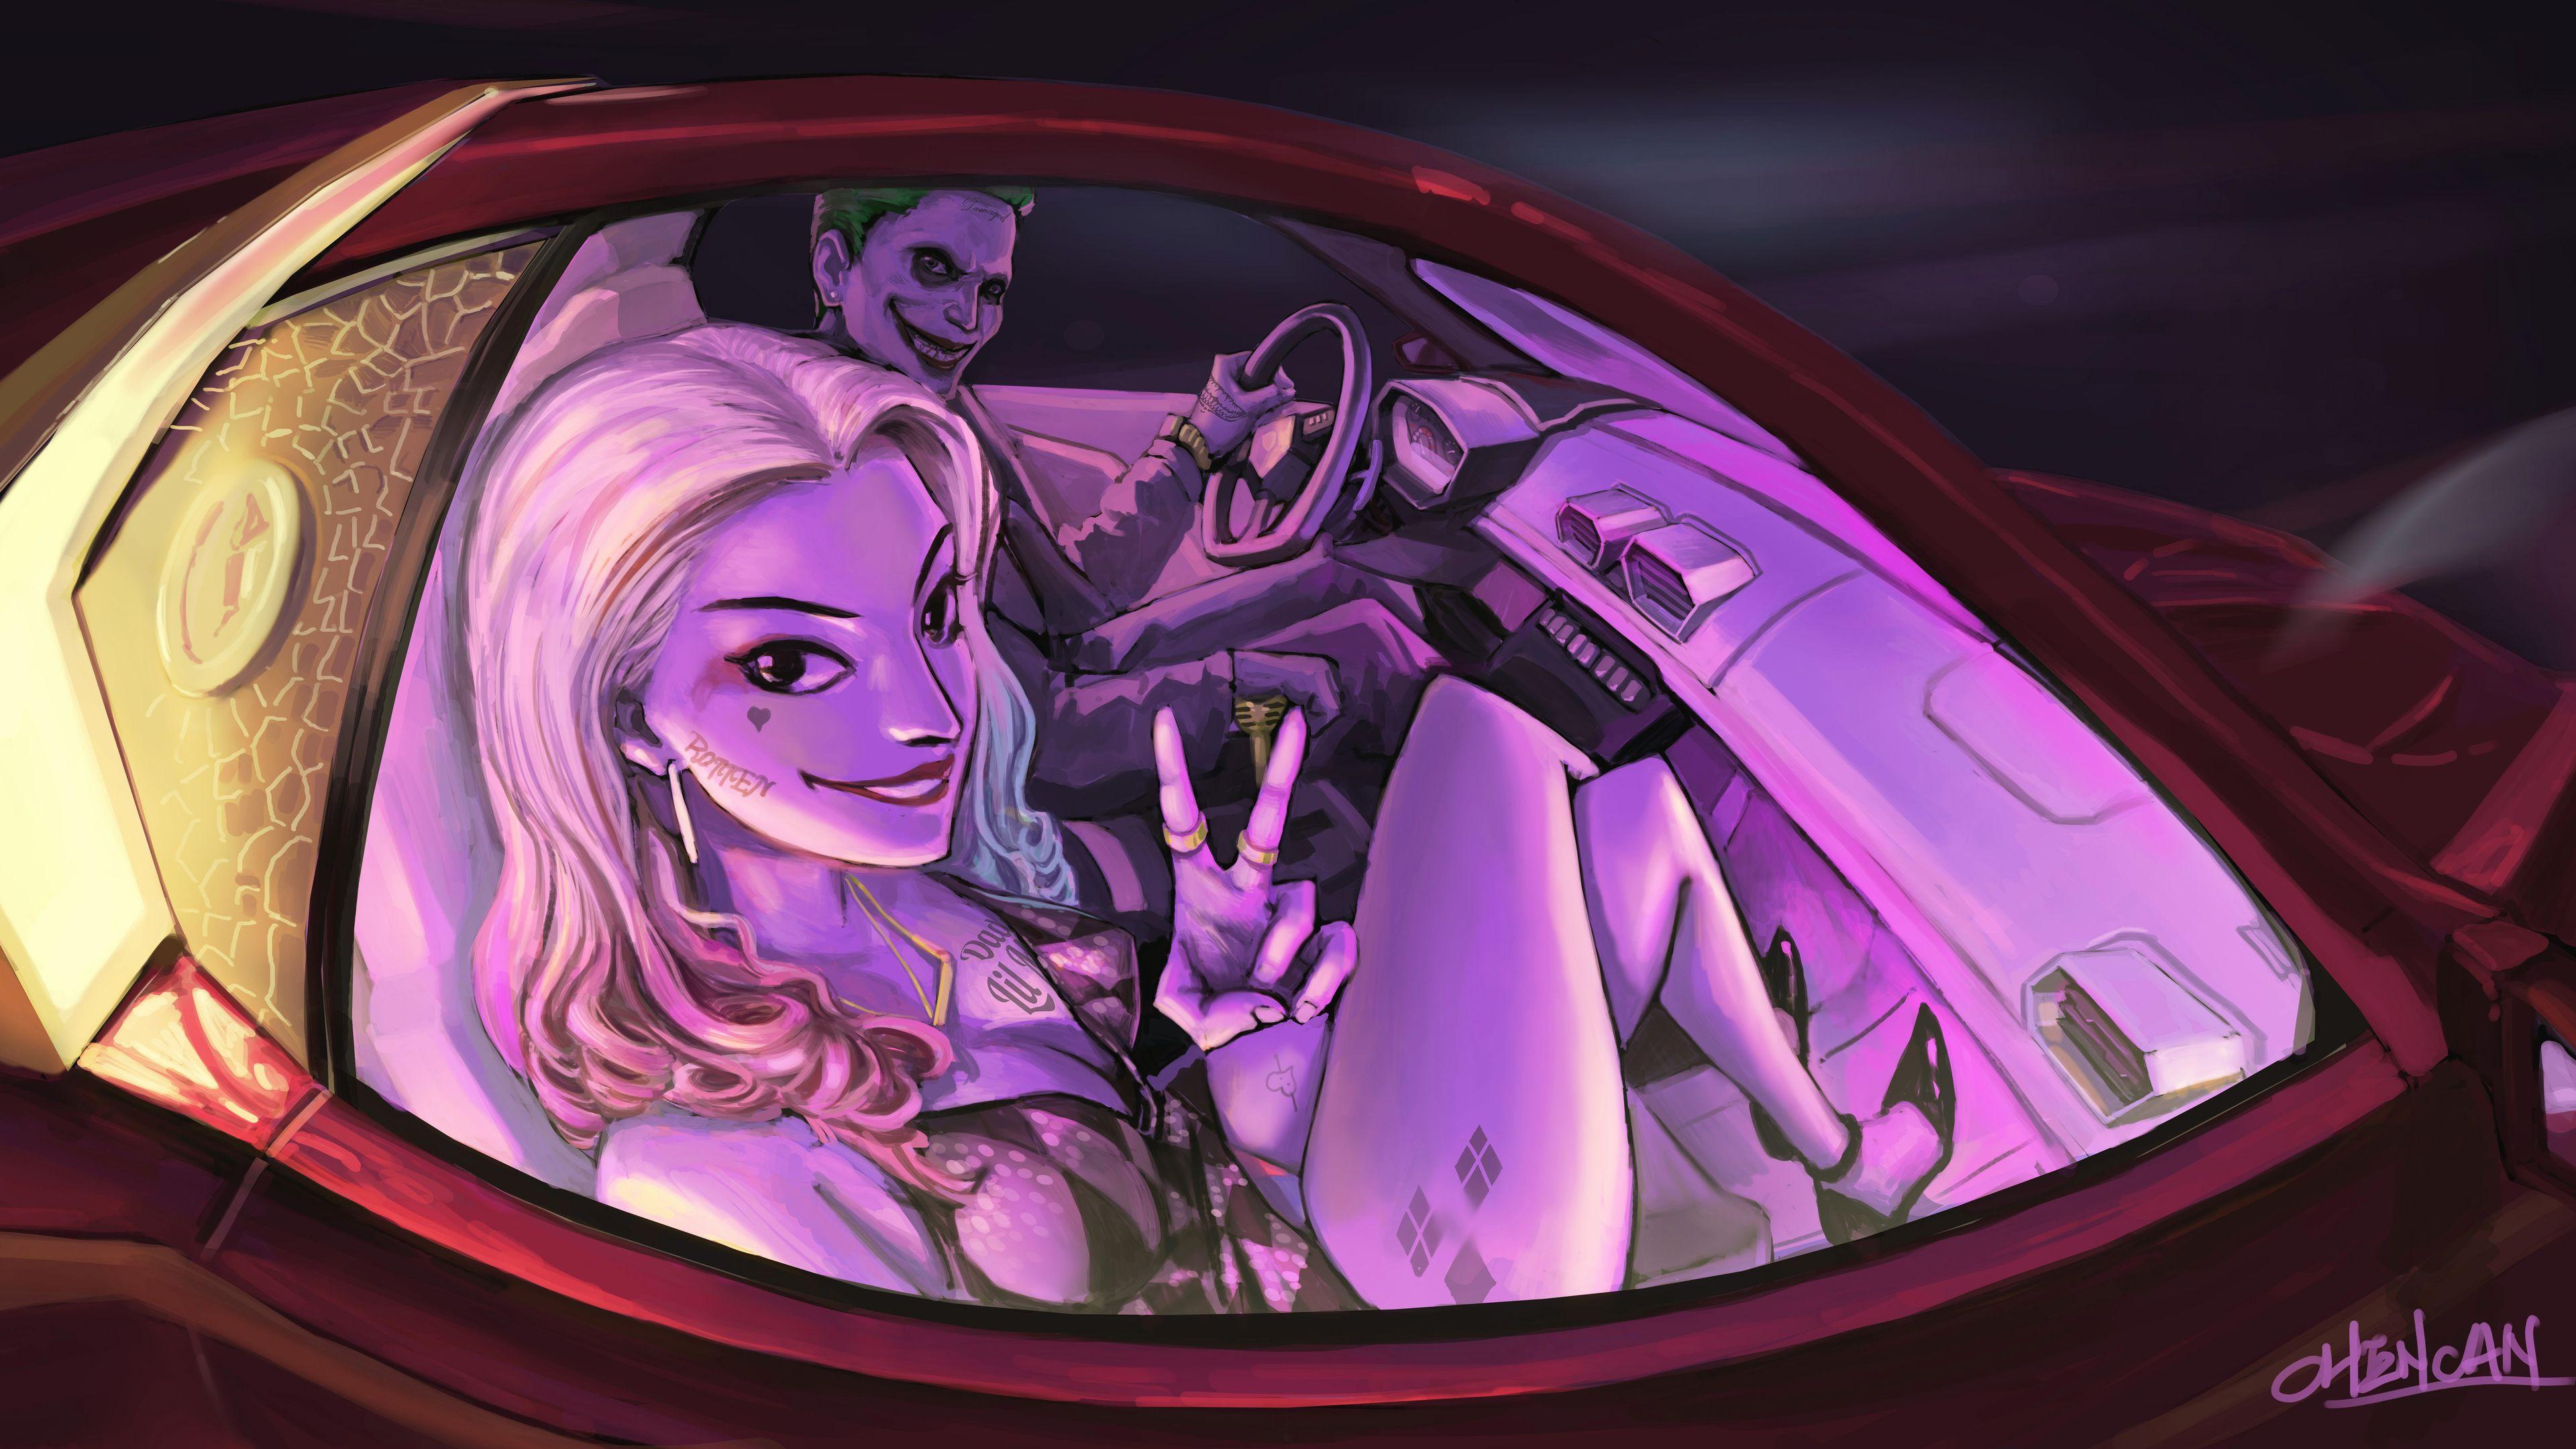 Joker And Harley Quinn In The Car Artwork 4k Superheroes Wallpapers